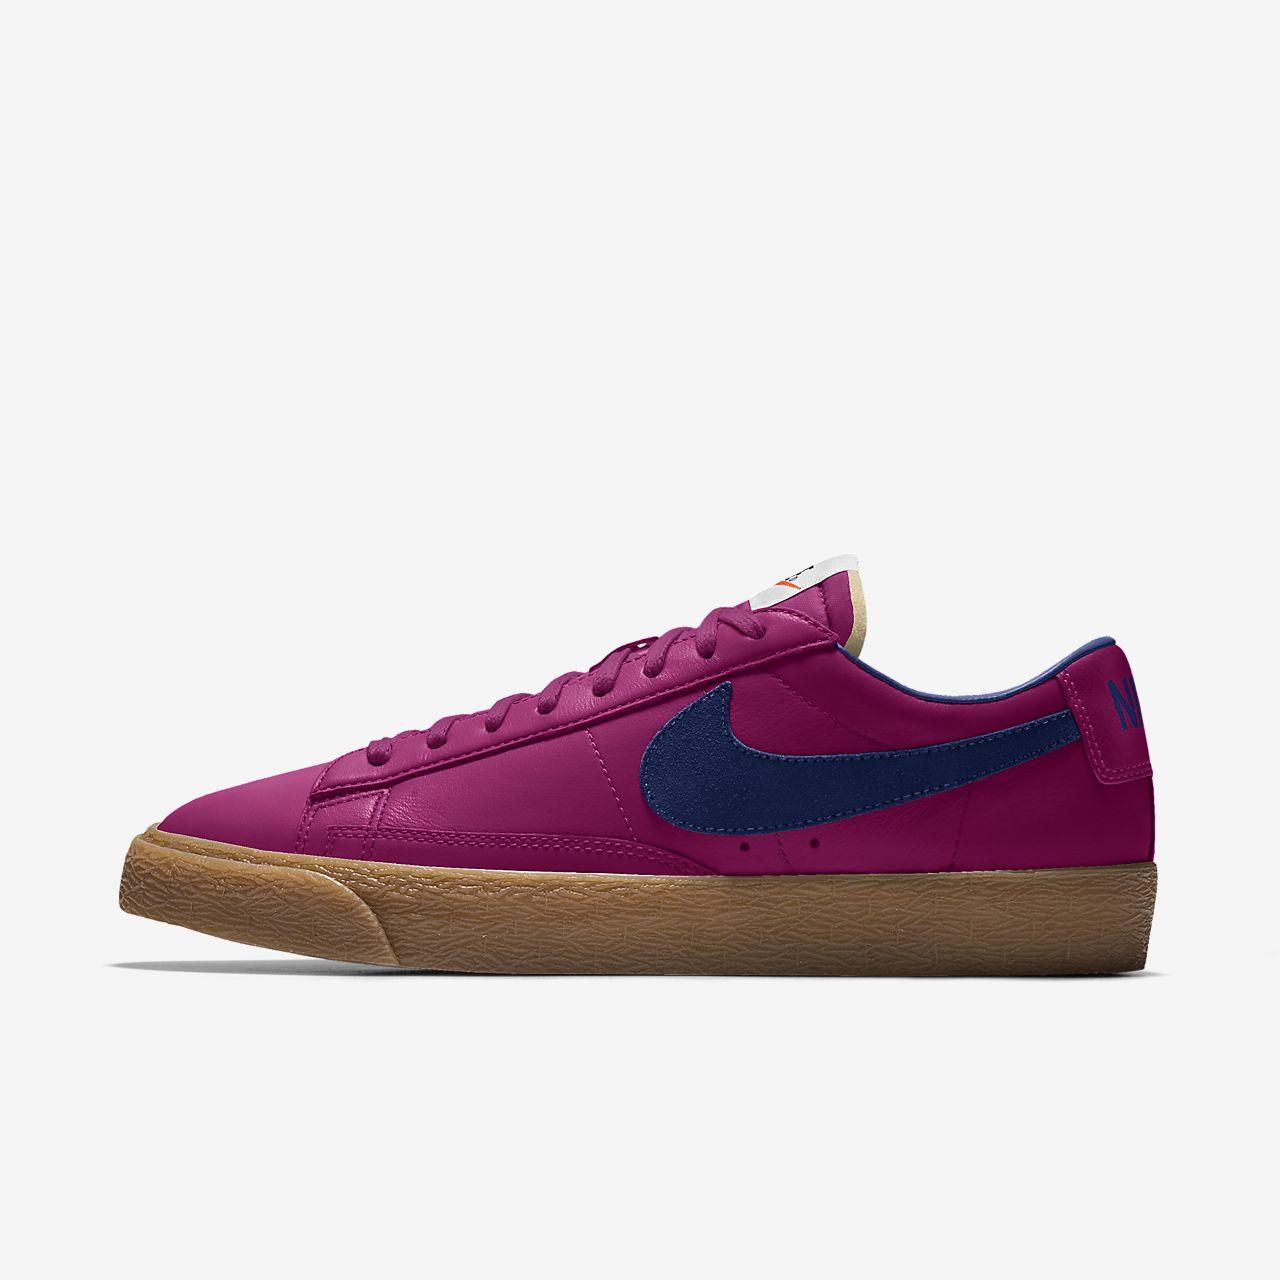 Calzado para mujer personalizado Nike Blazer Low By You